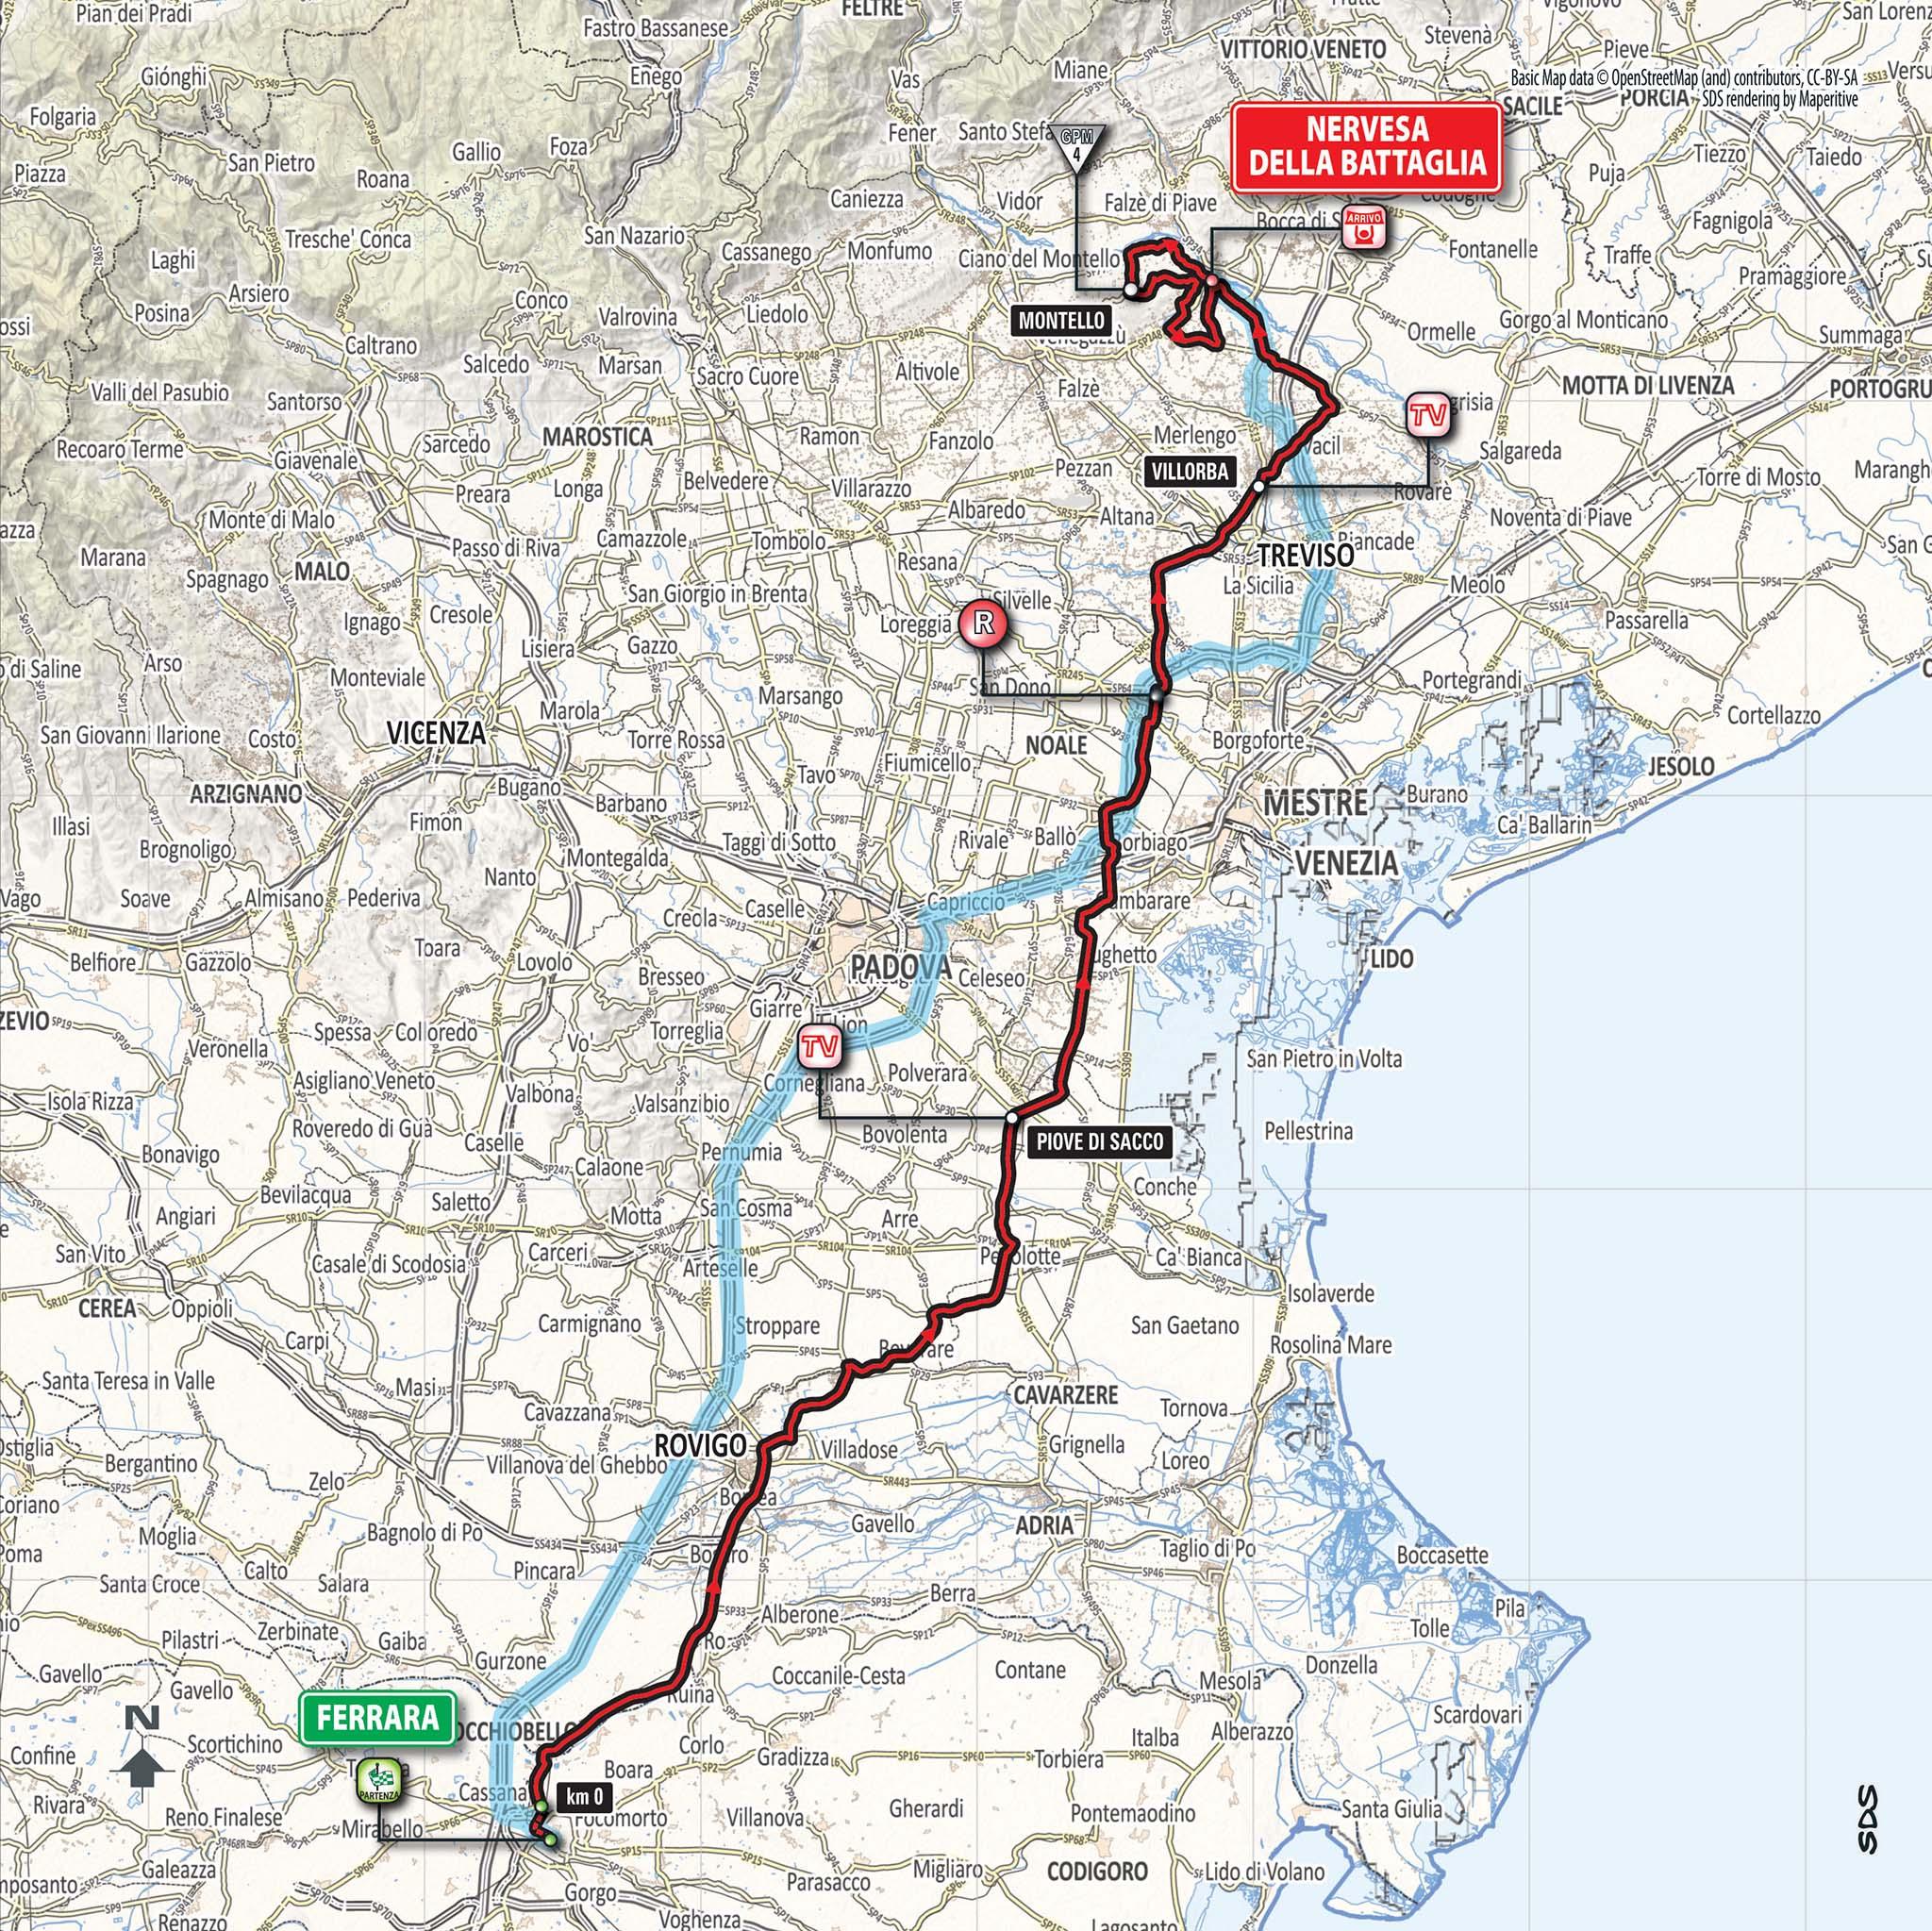 Parcours étape 13 Giro 2018